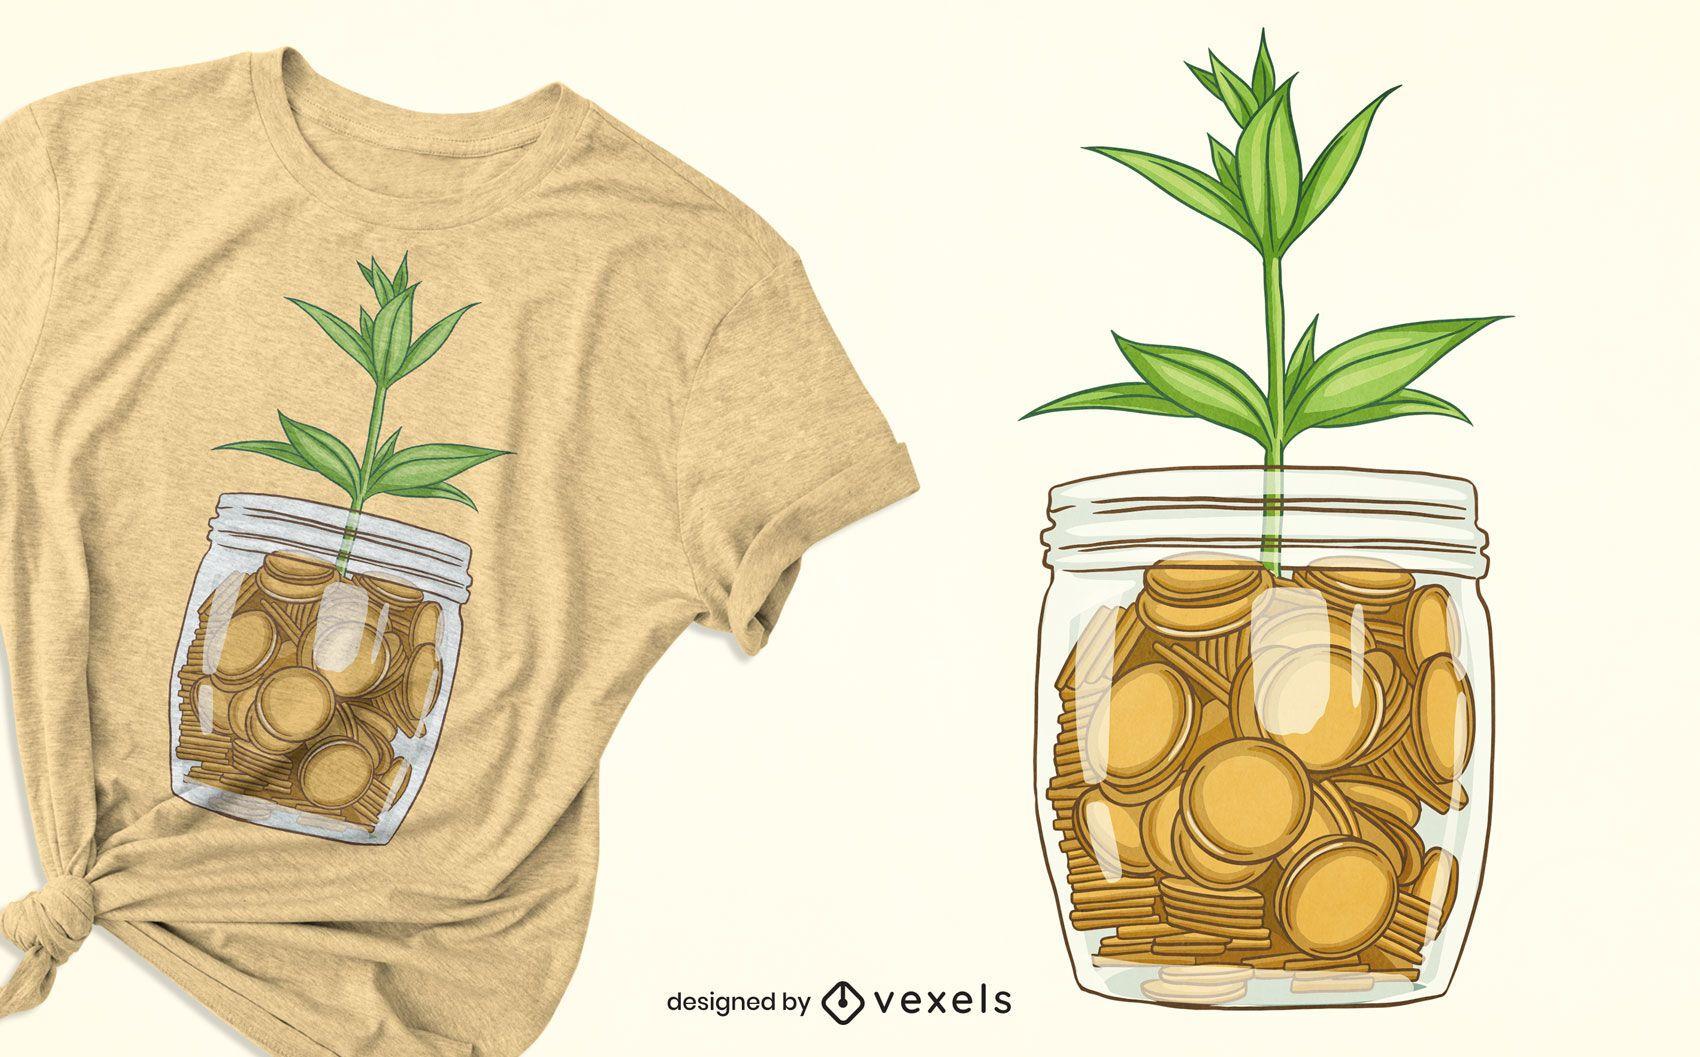 Coin jar plant t-shirt design